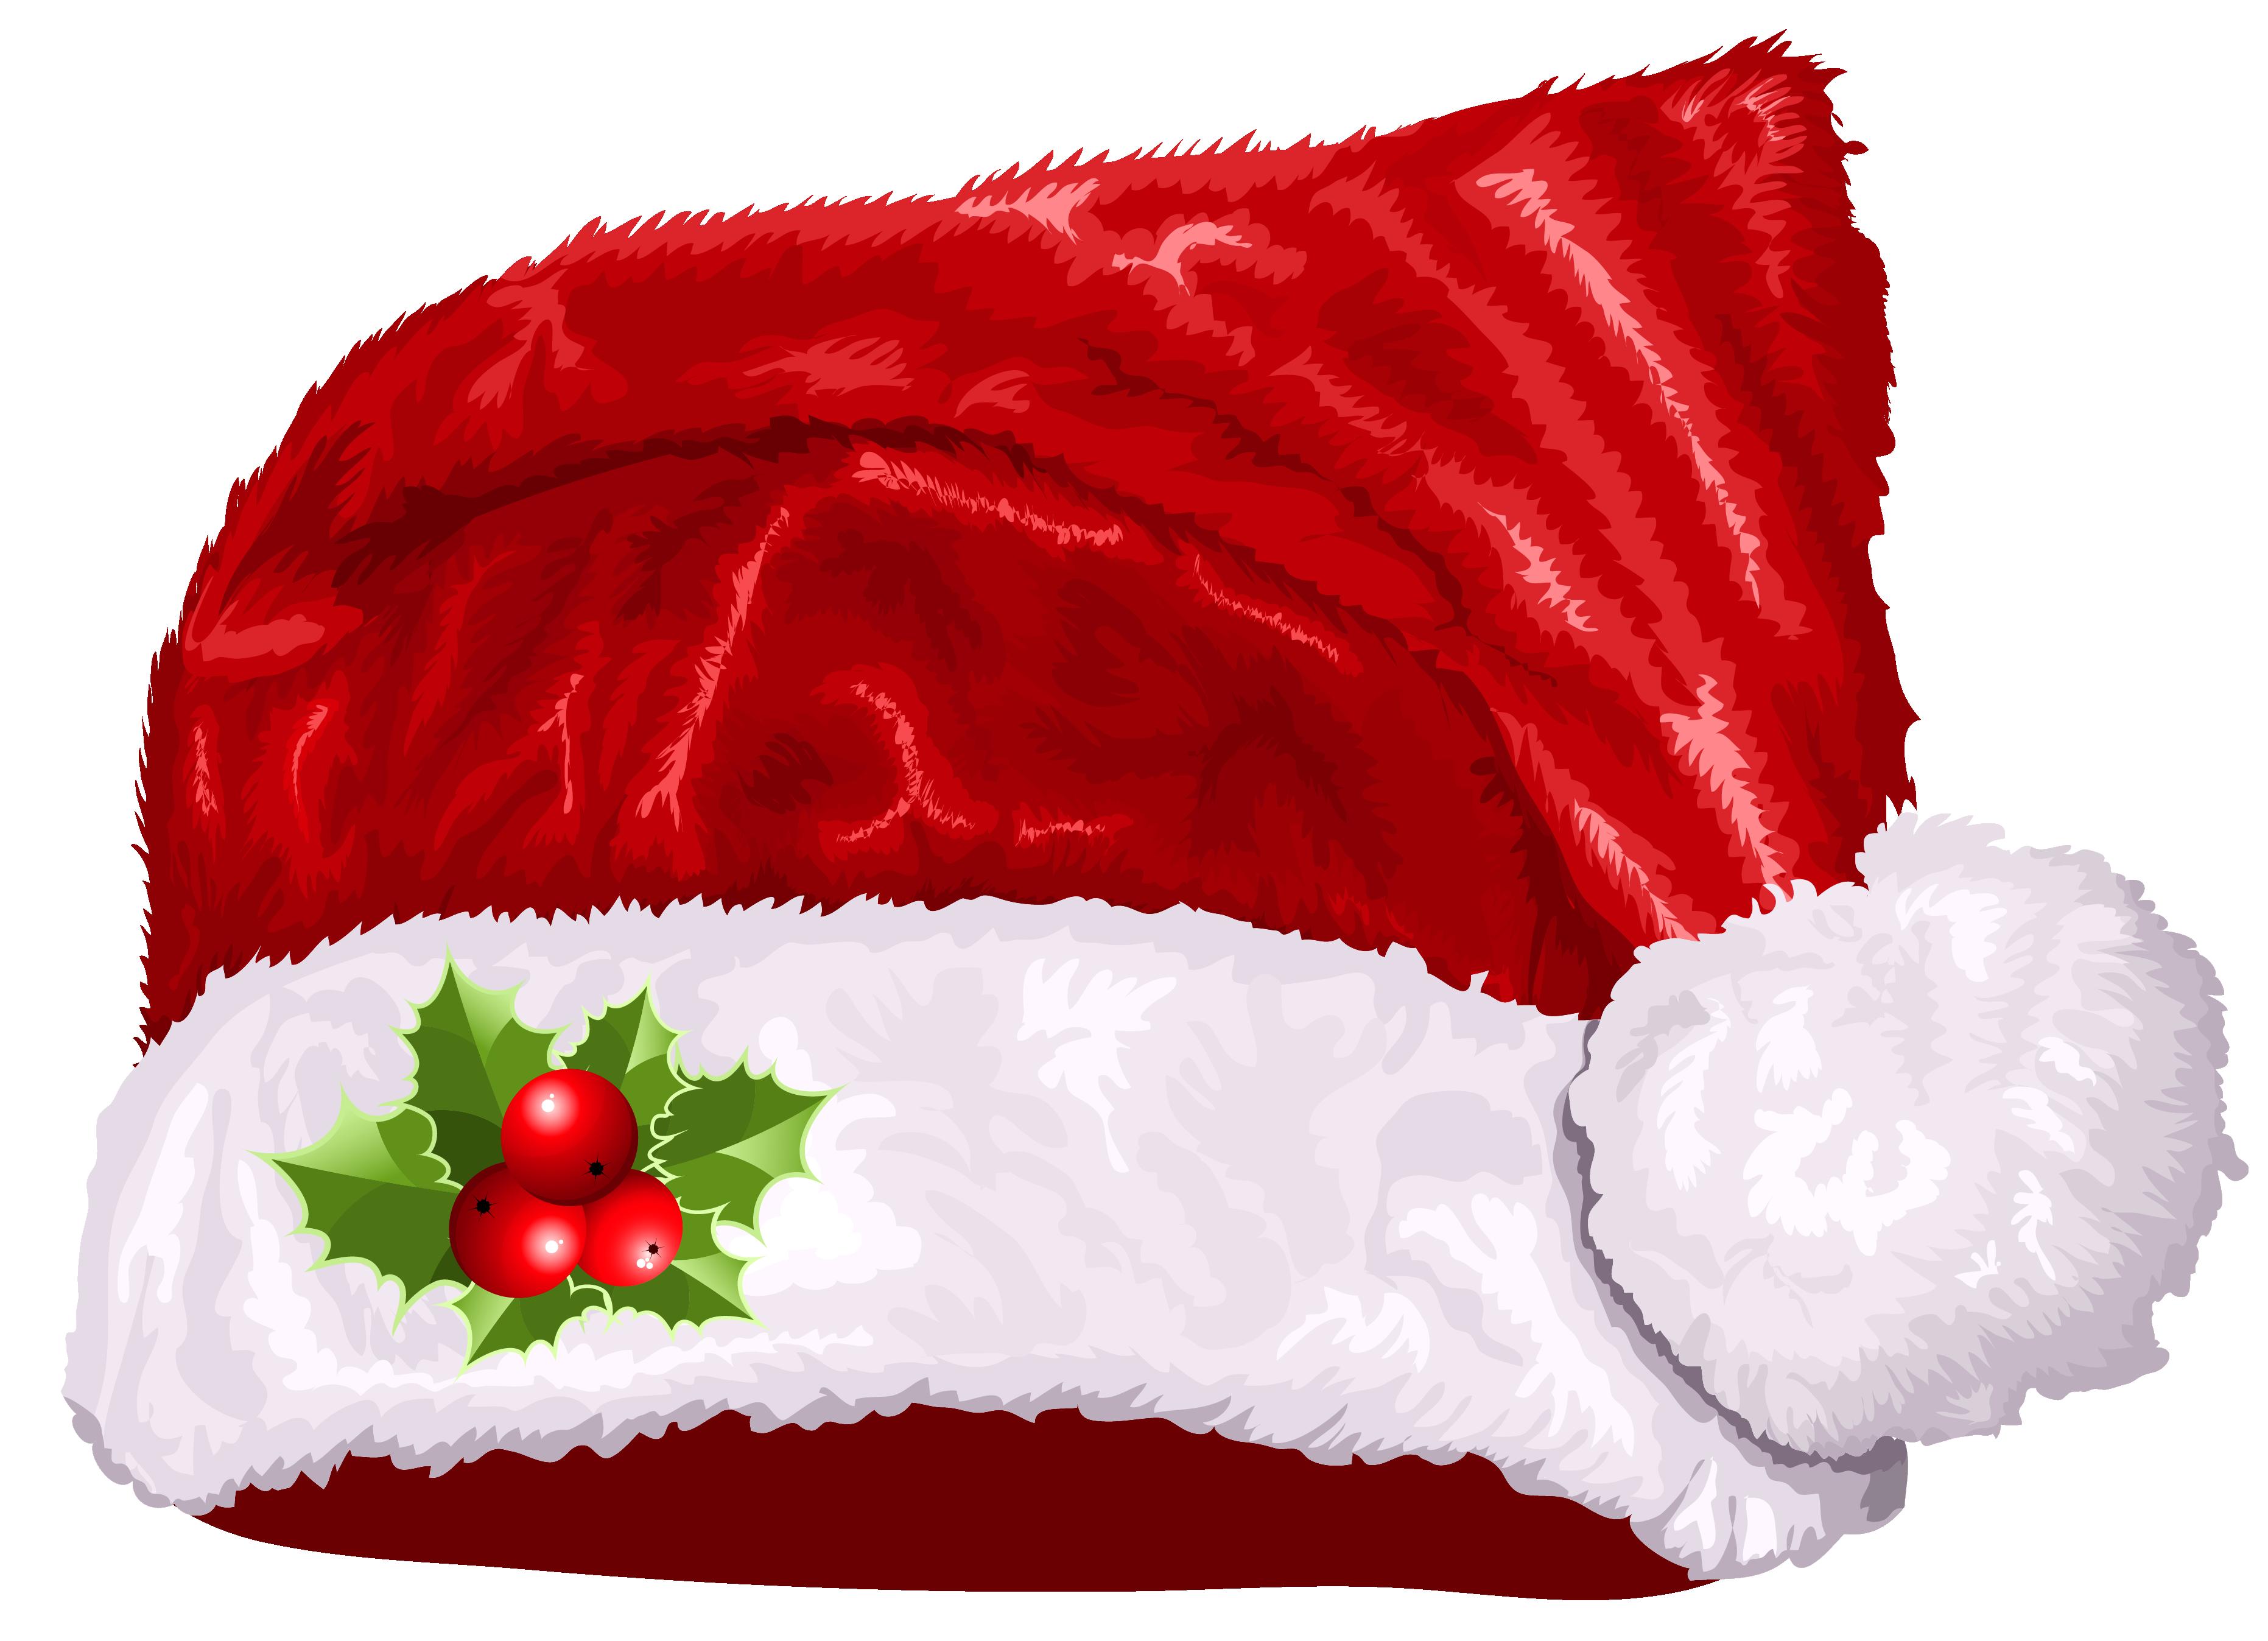 Gloves Clipart Google Search Bonnet Noel Image Noel Noel